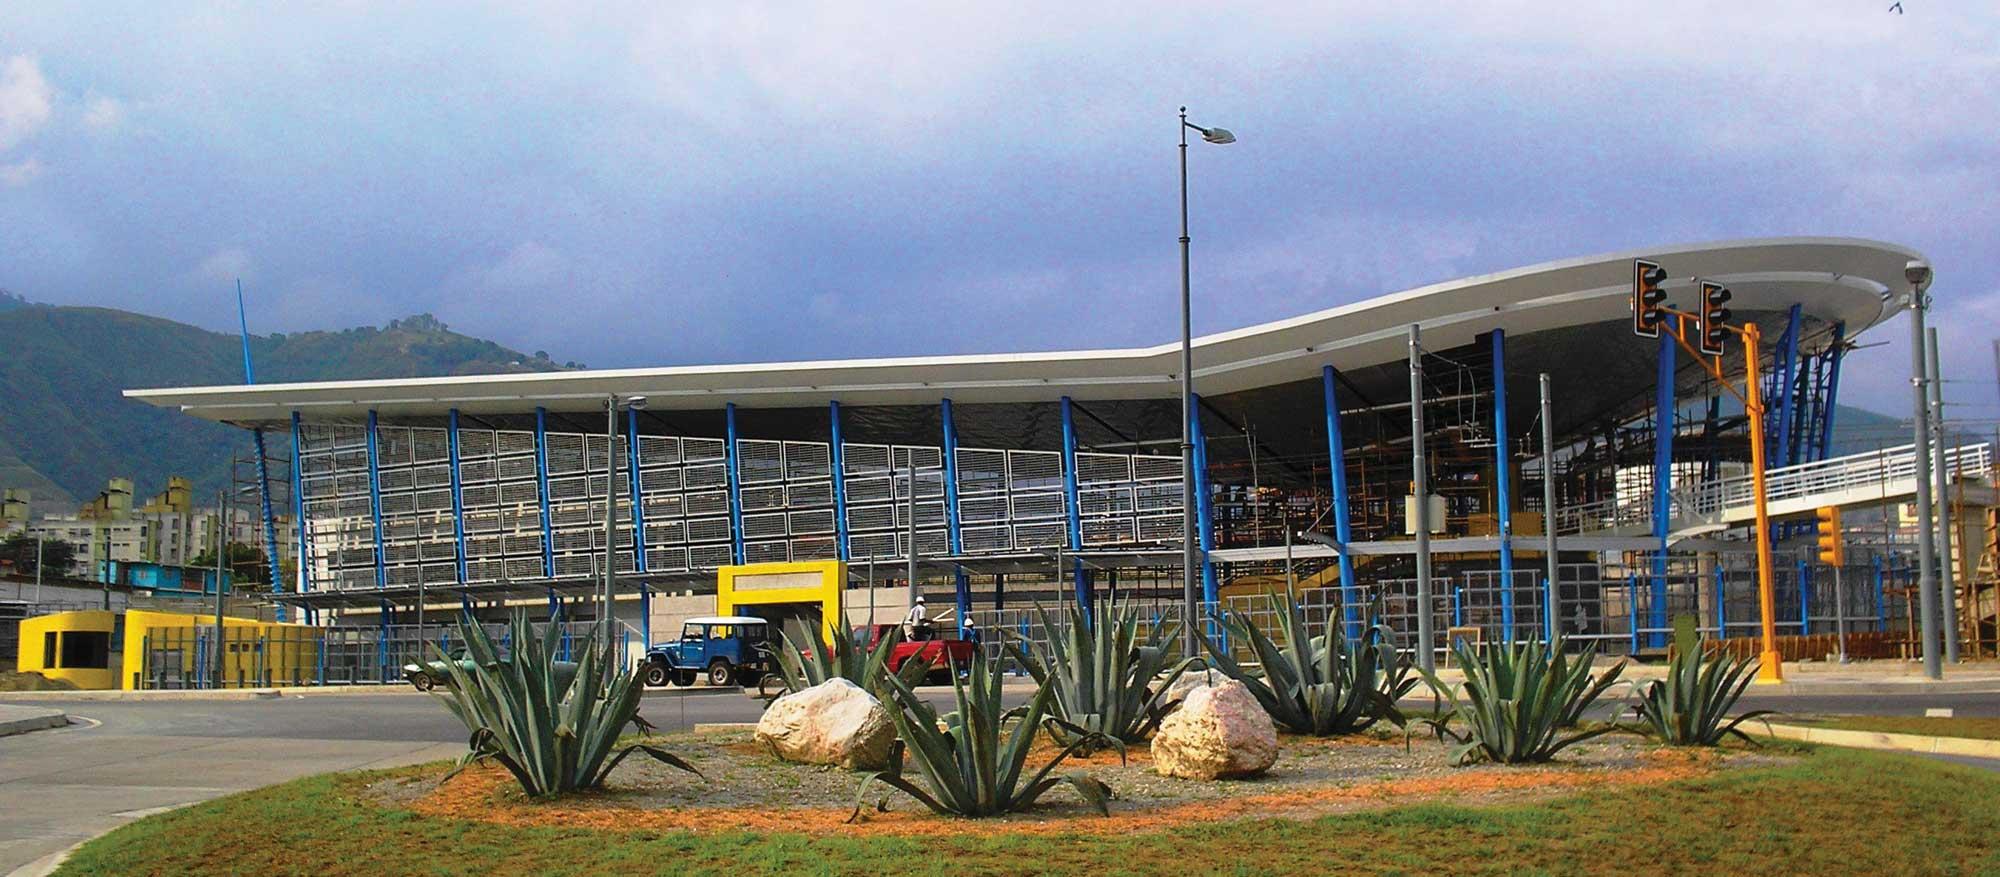 Obra arquitectónica venezolana se expone en VI Bienal en Bolivia